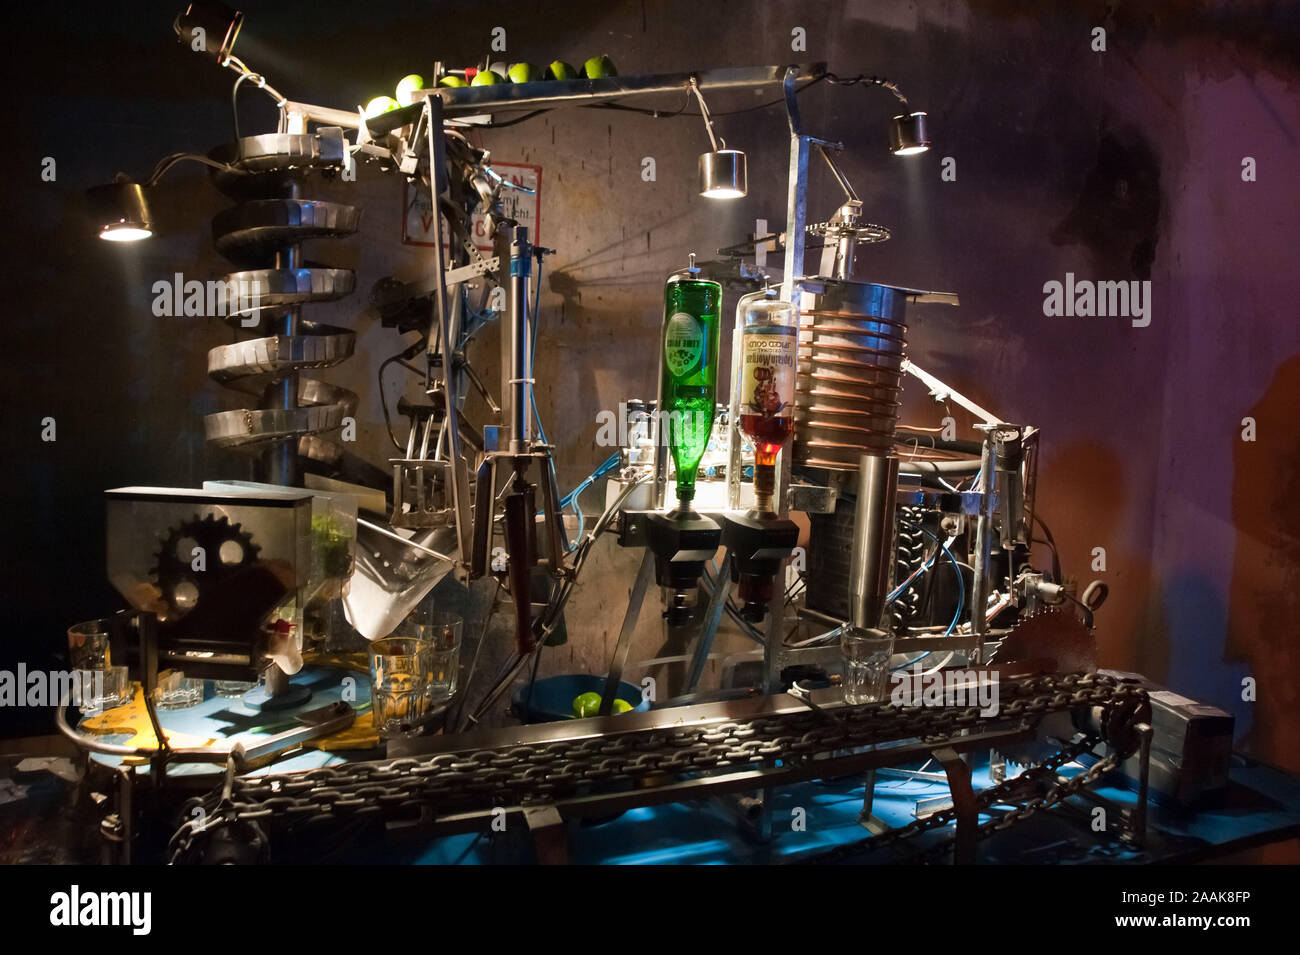 Wien, Roboexotica, Roboter Boissons mixen Banque D'Images